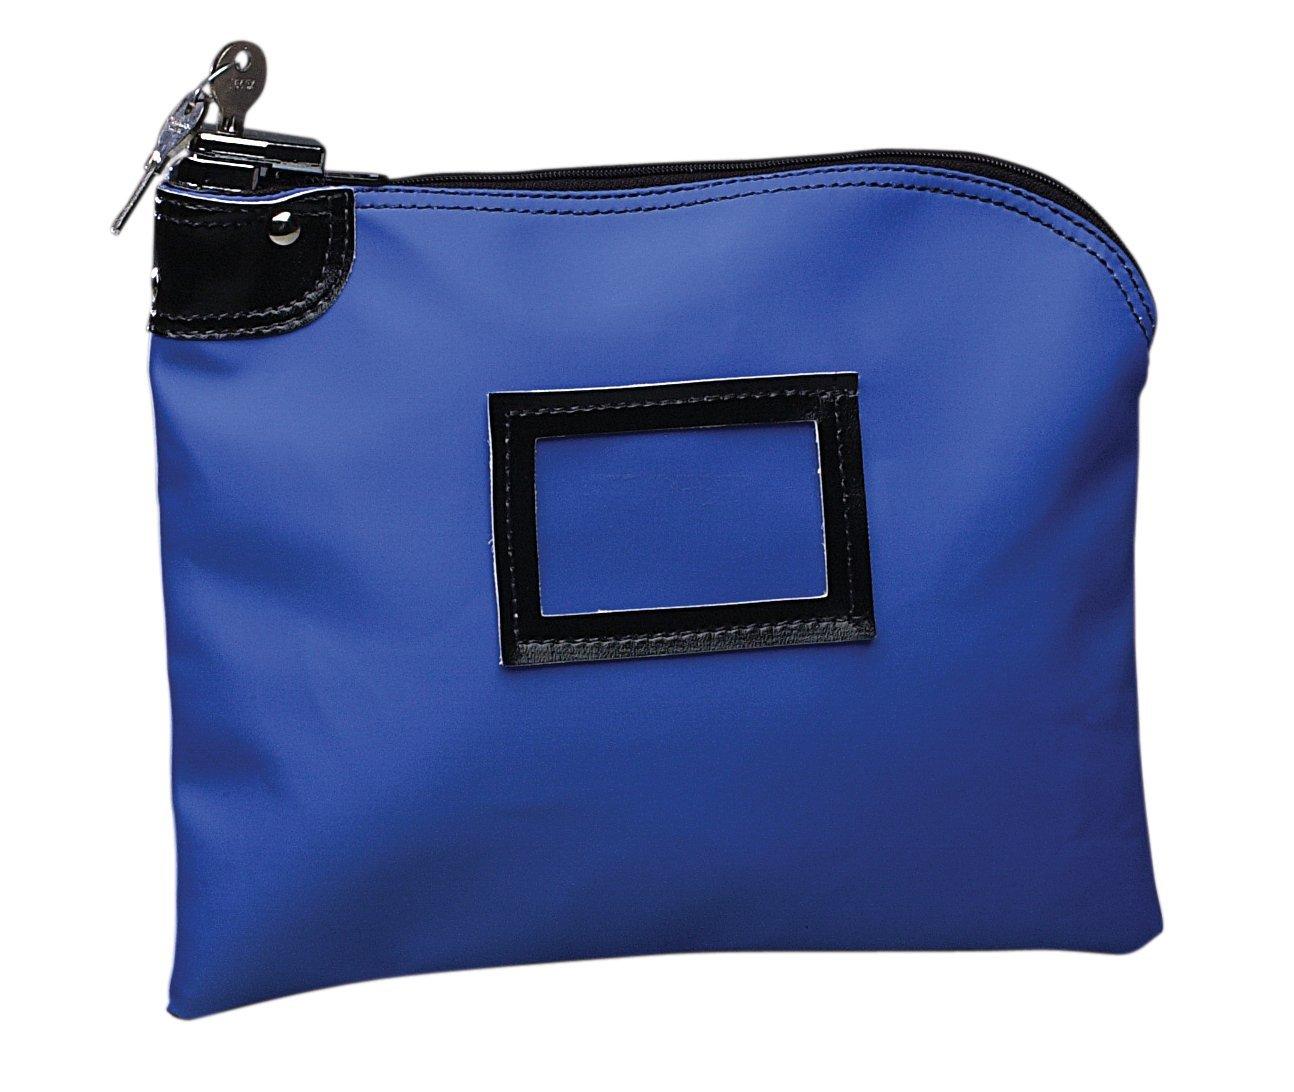 PM Company SecurIT Nylon Night Deposit Bag with Lock, 9 x 12 Inches, Blue, 1 per Box (04629)